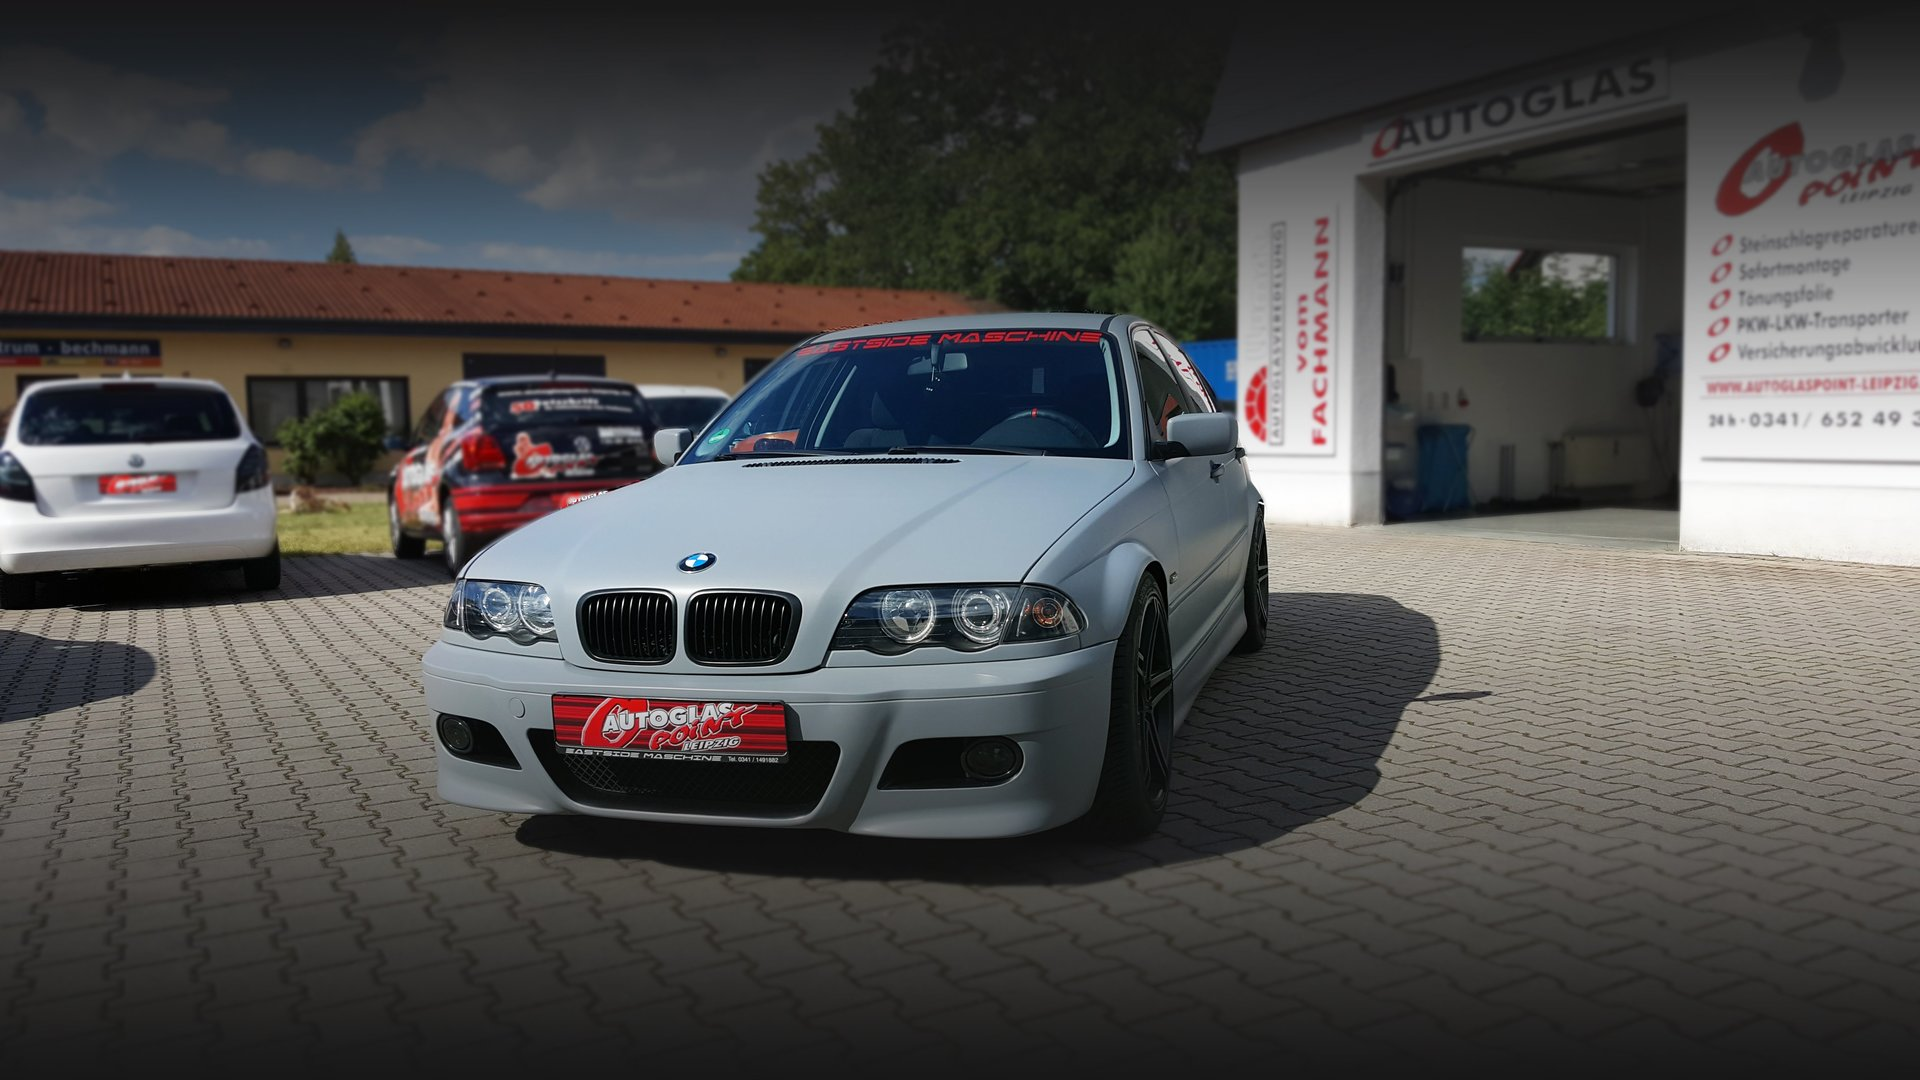 BMW graue Folierung des Fahrzeugs